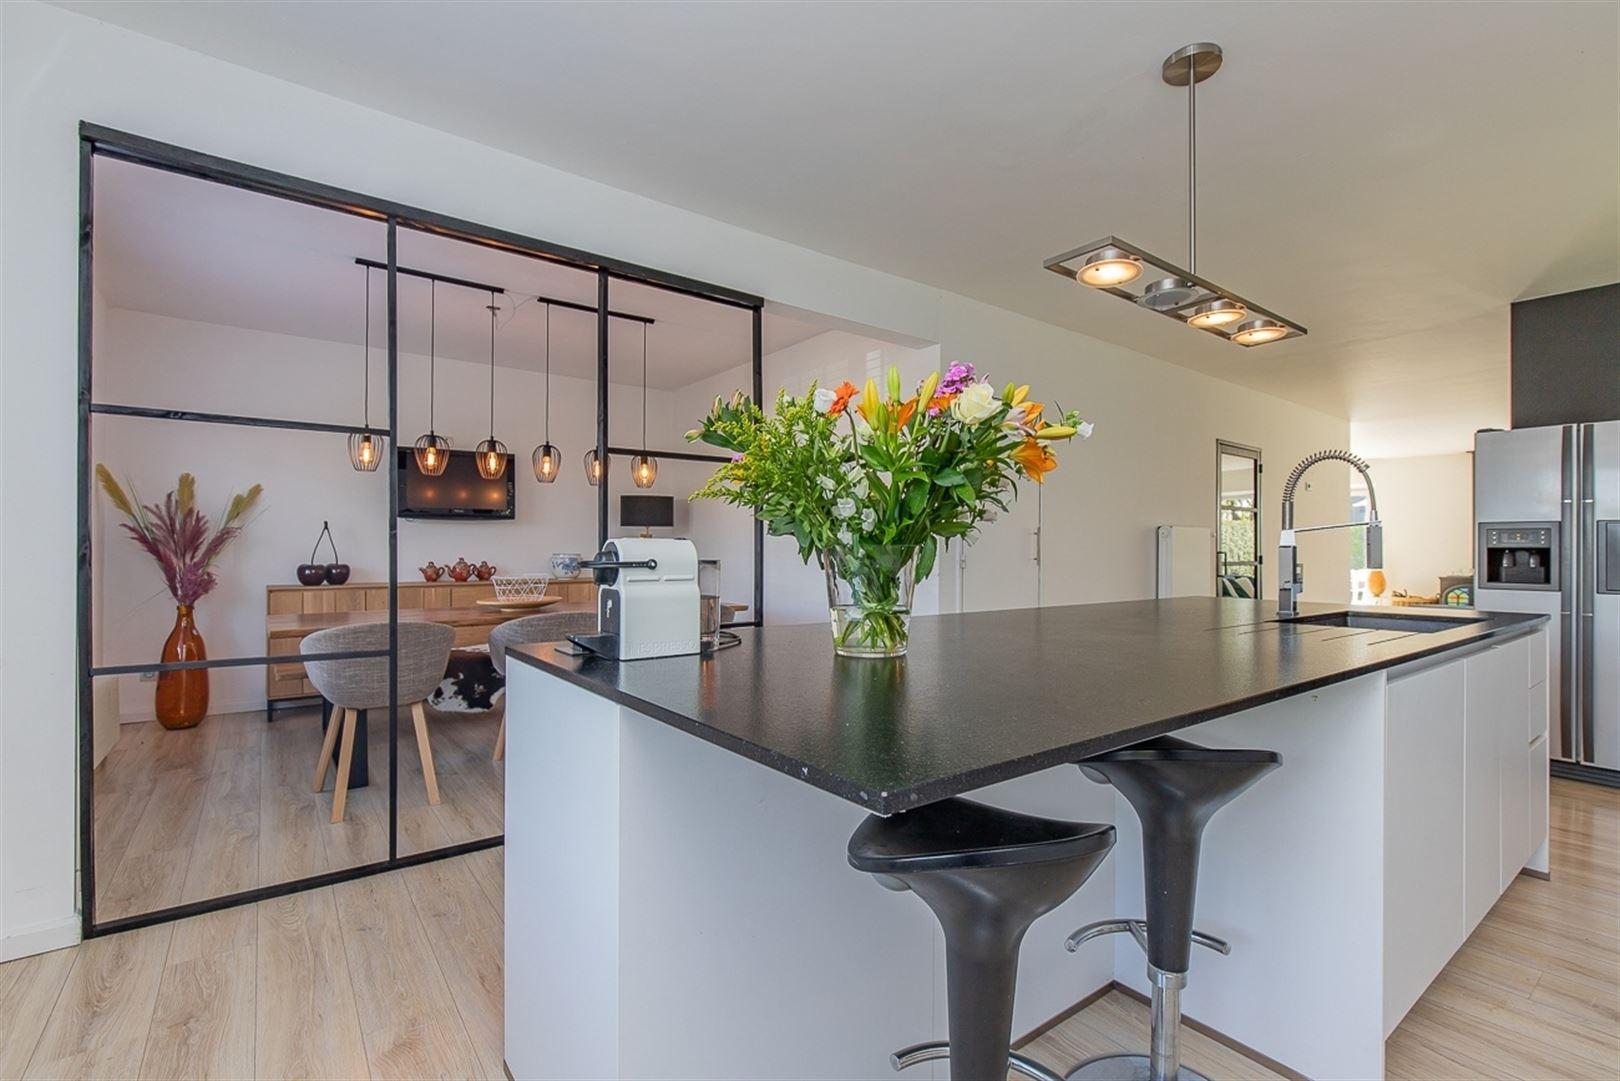 Foto 3 : Villa te 9100 SINT-NIKLAAS (België) - Prijs € 549.000